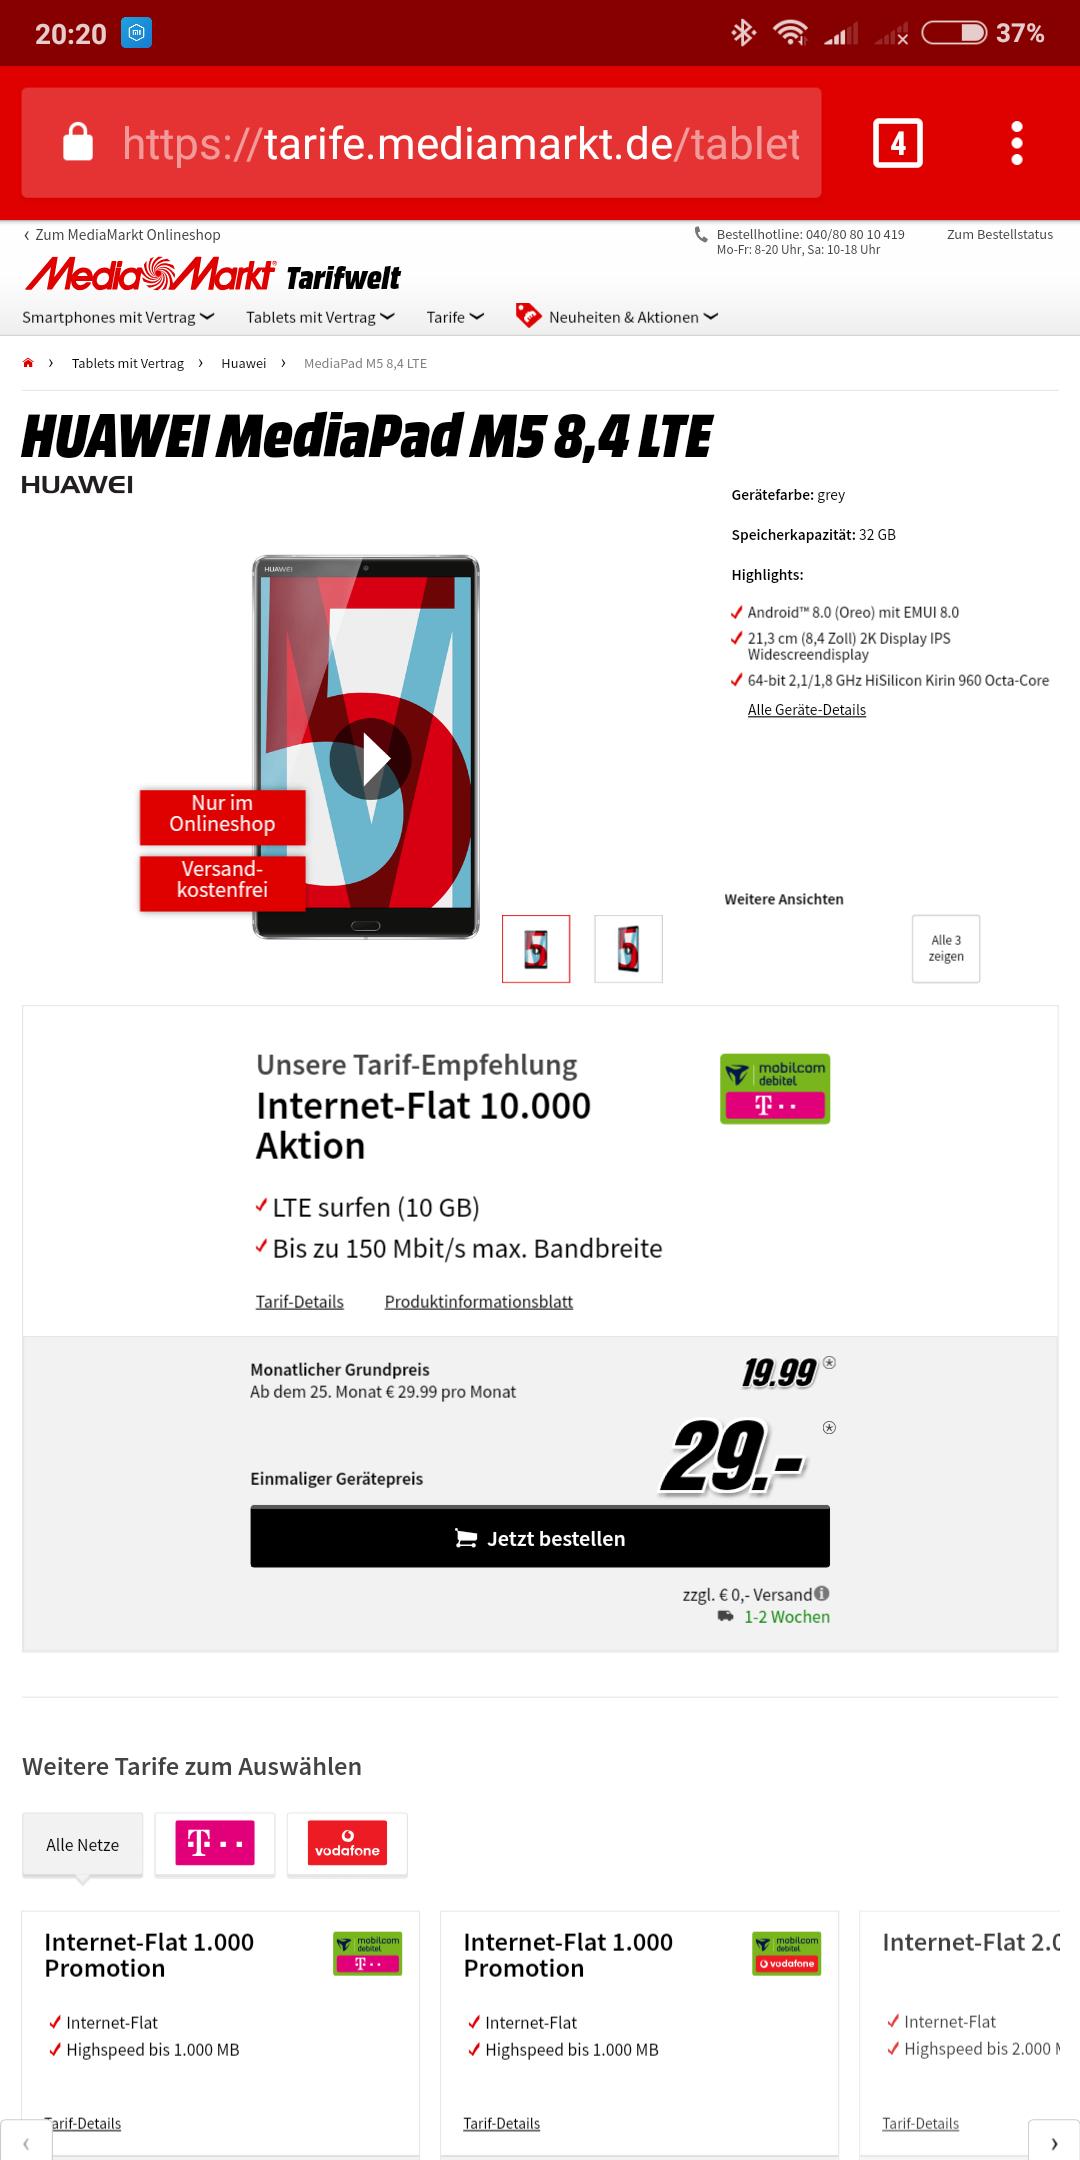 Telekom 10 GByte Datenflat + Huawei M5 LTE